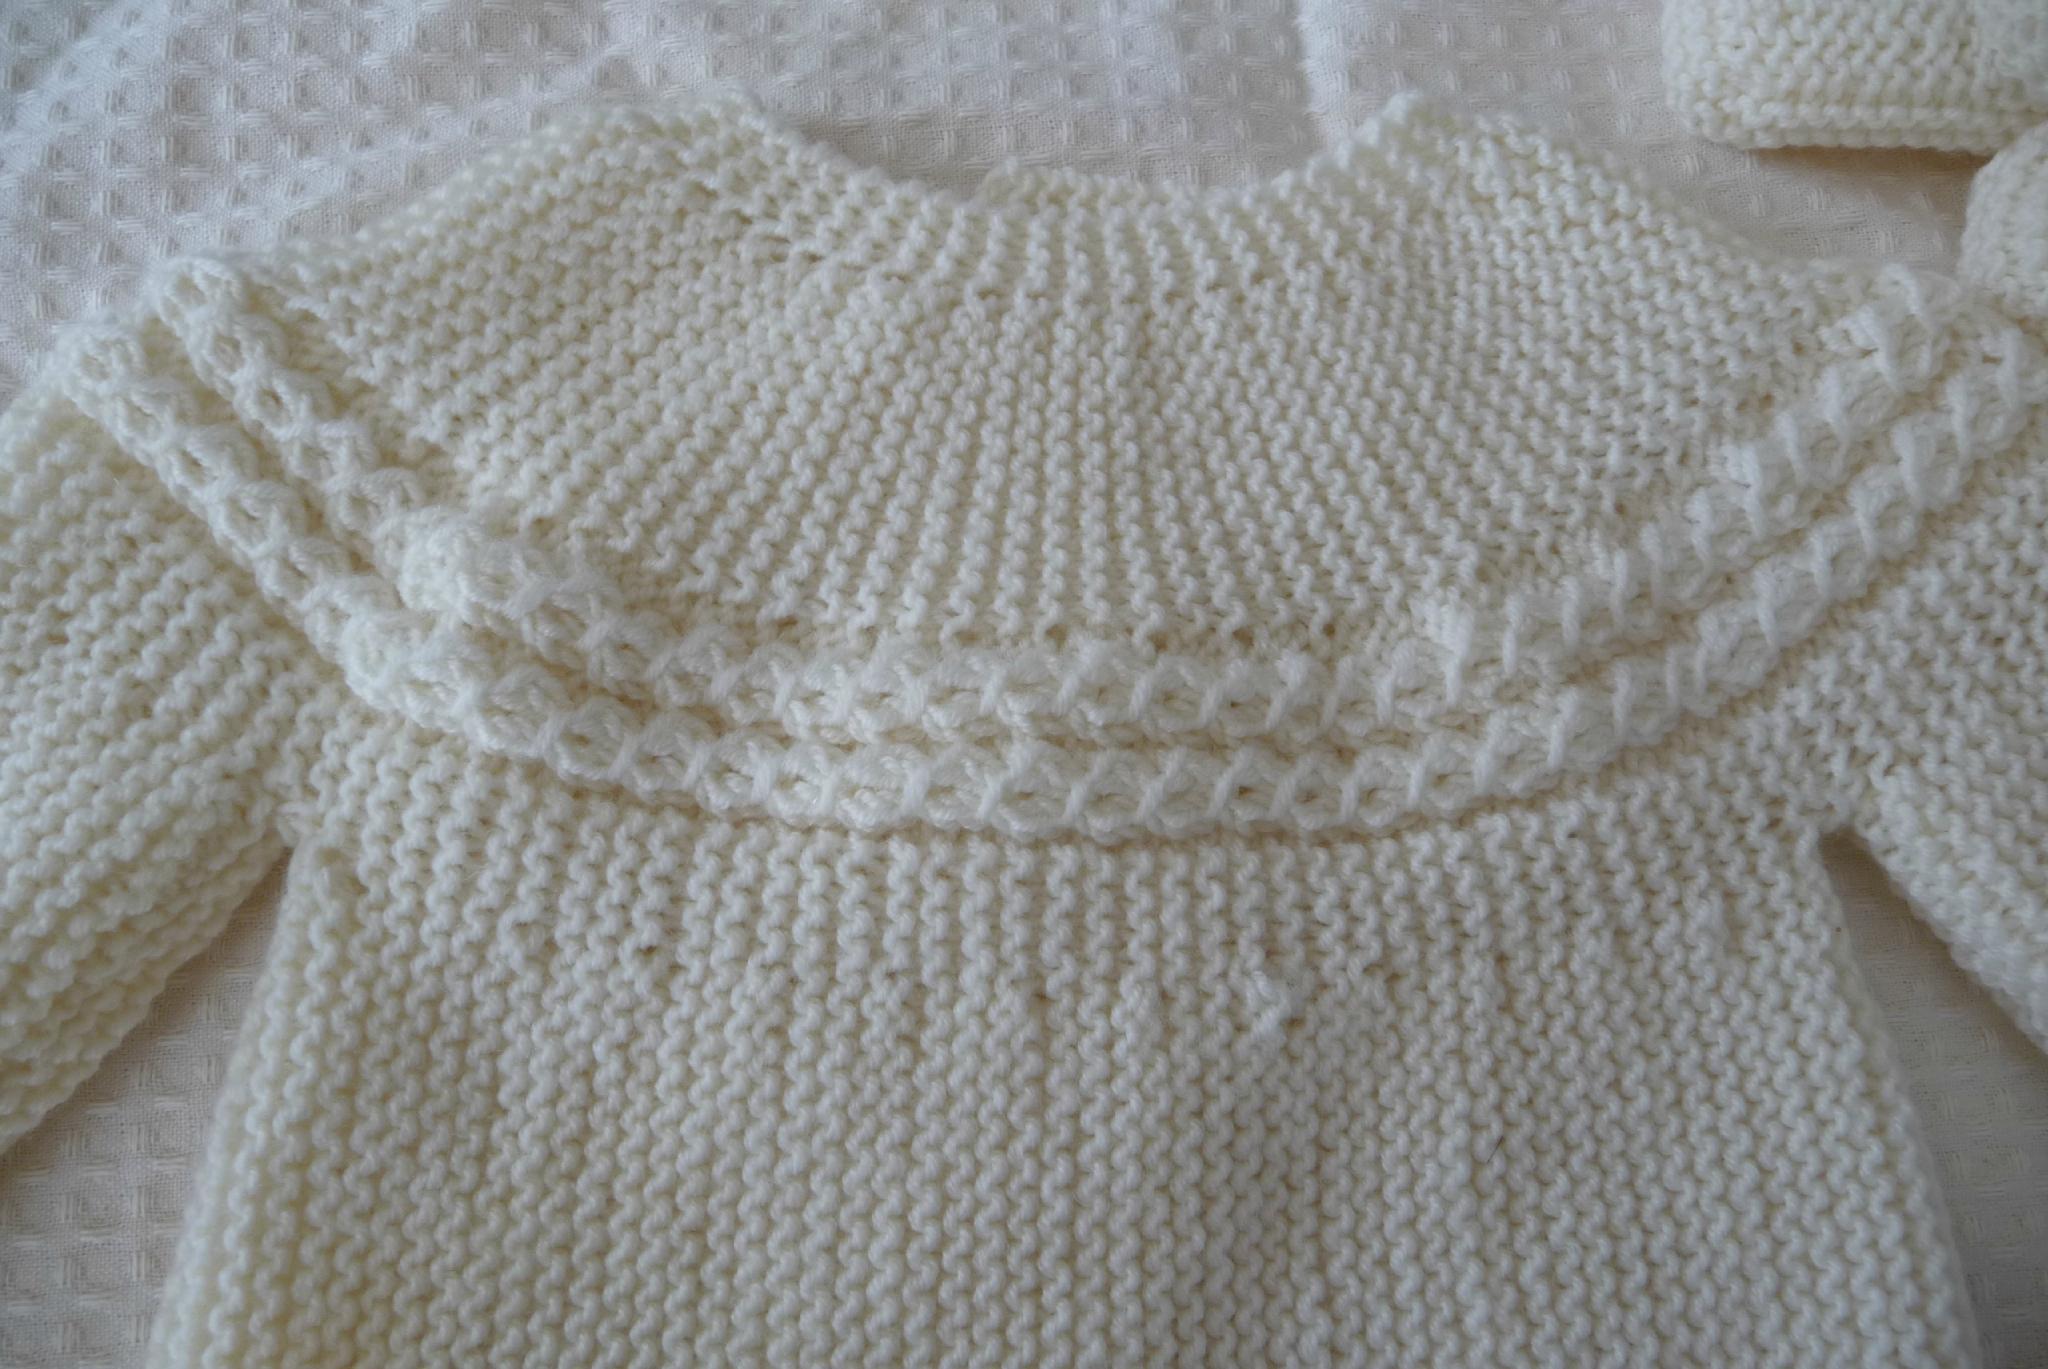 Tricot brassiere torsade